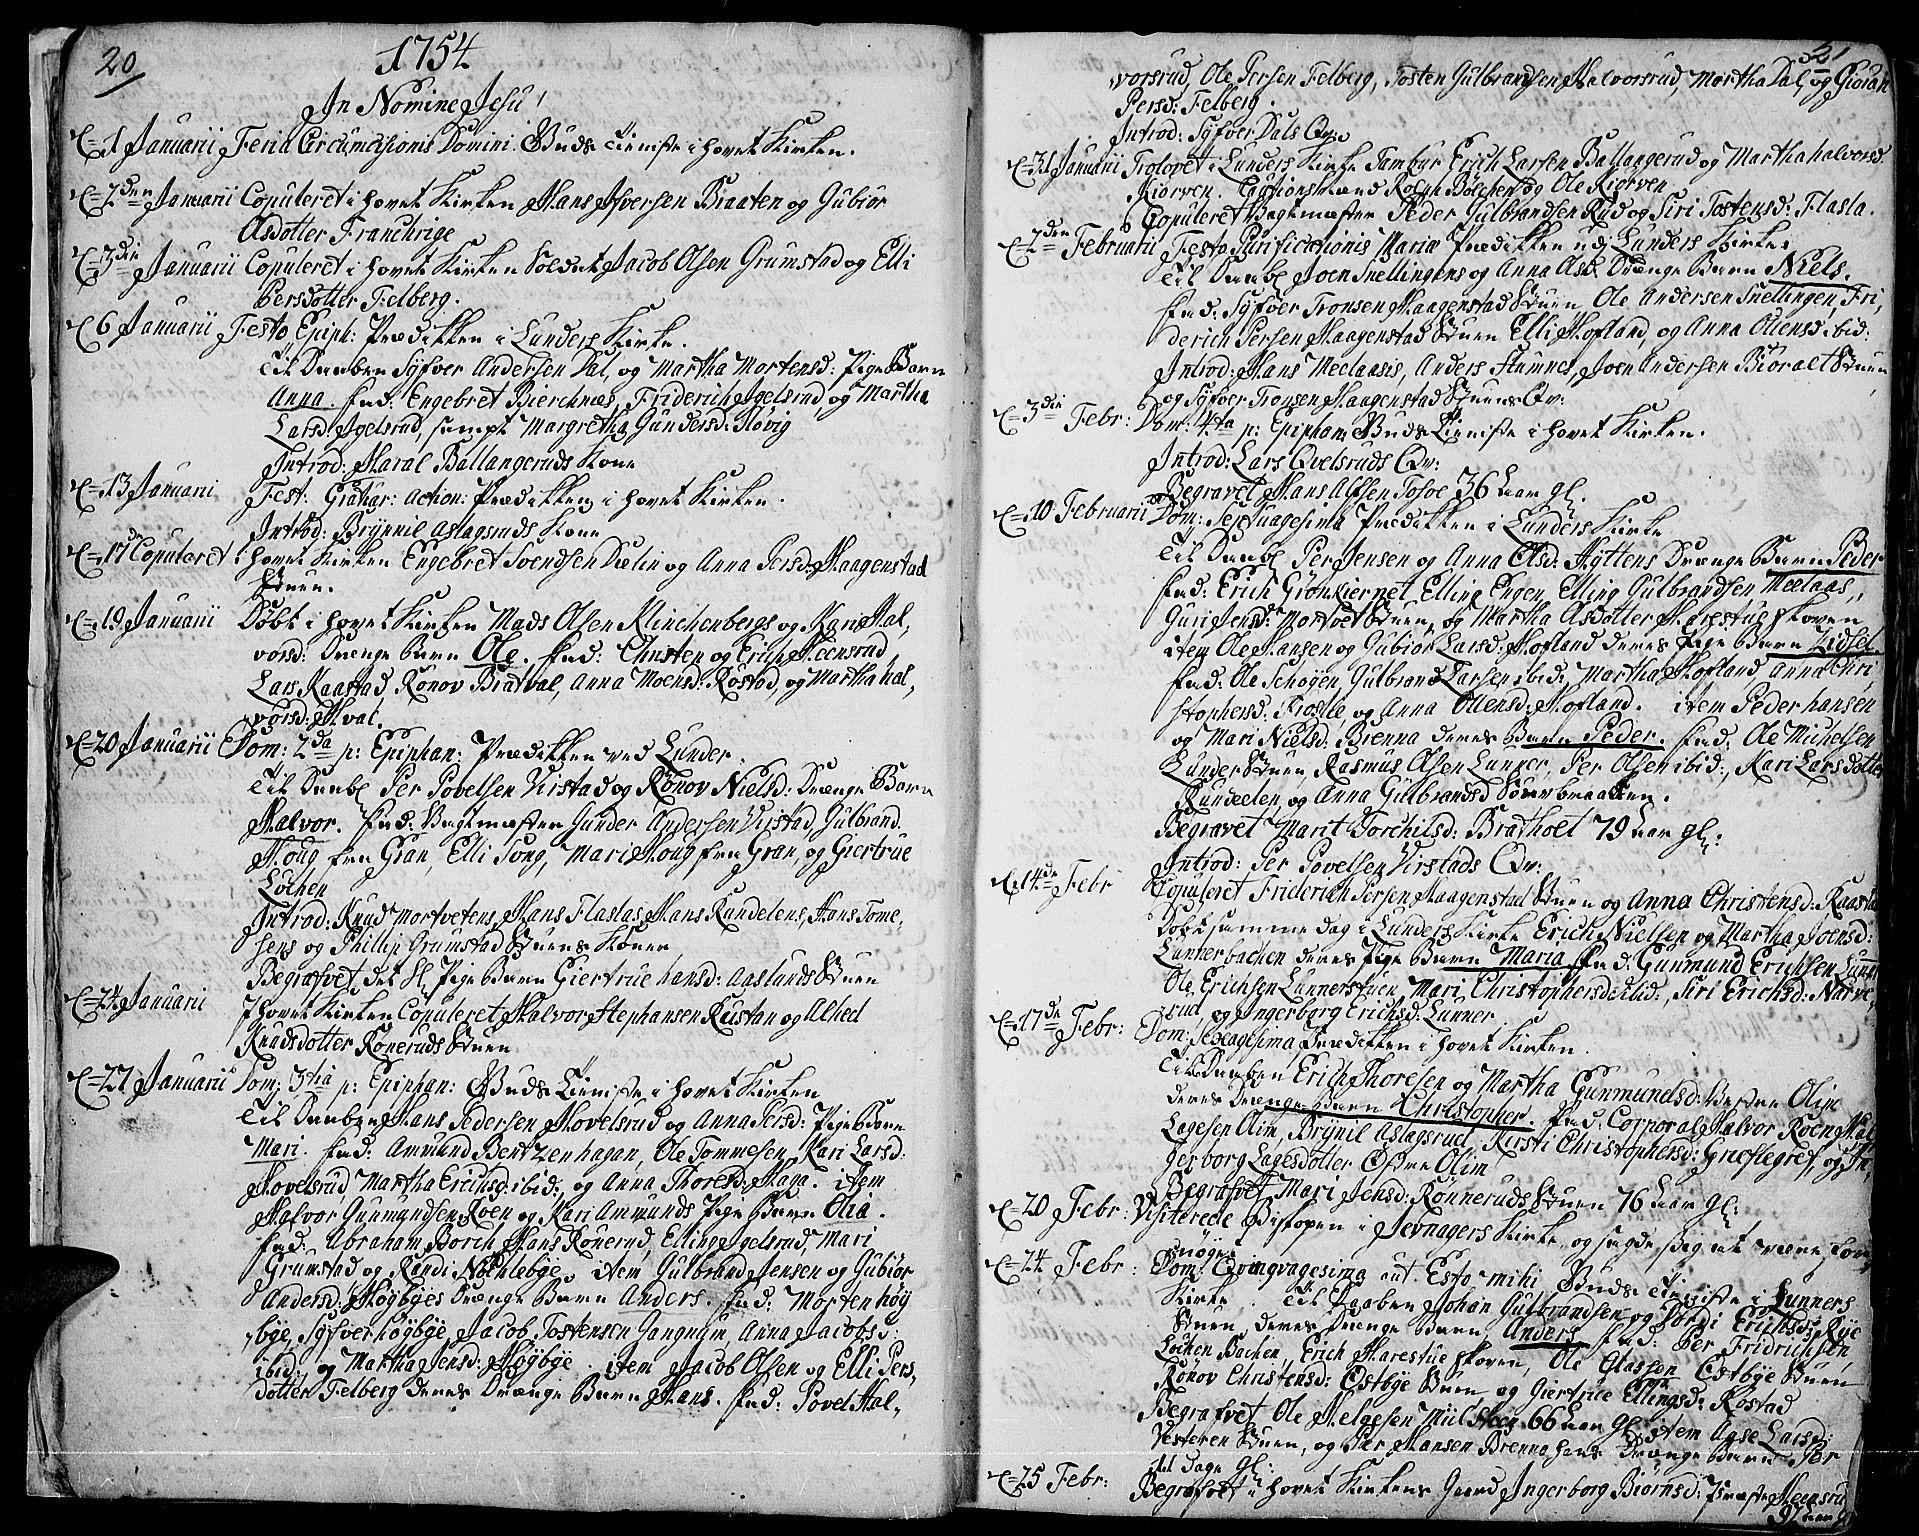 SAH, Jevnaker prestekontor, Ministerialbok nr. 3, 1752-1799, s. 20-21